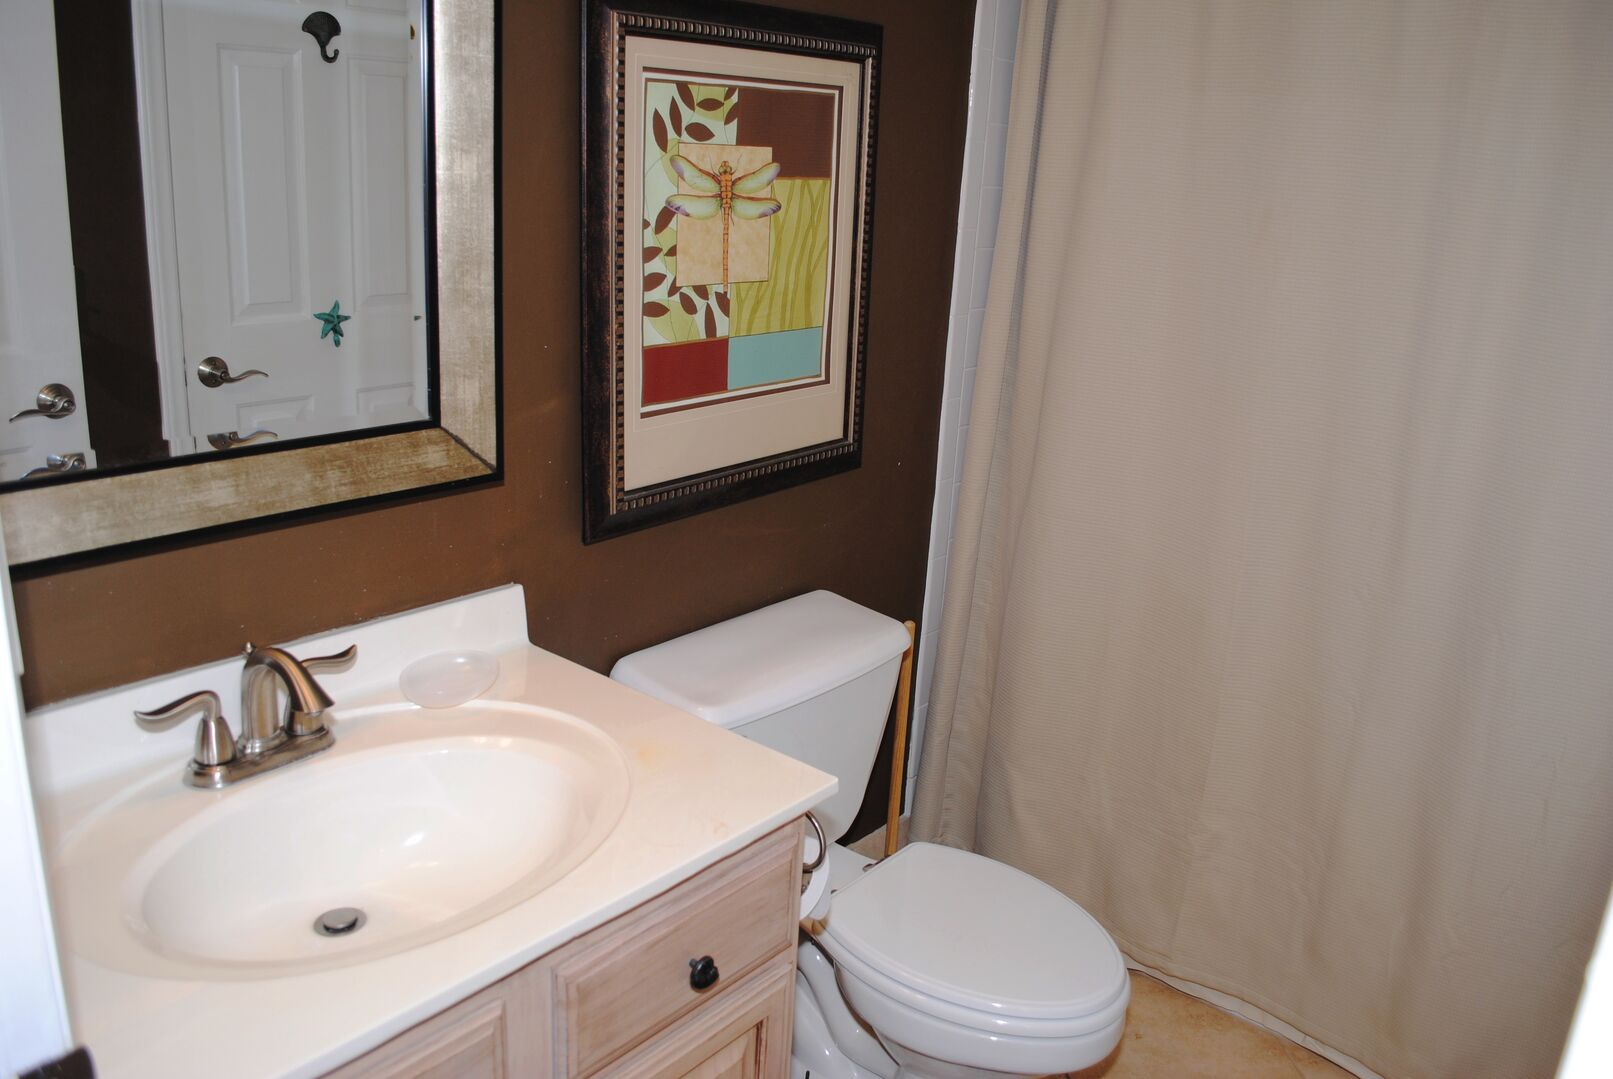 Shared Bathroom (Queen and Hallway)